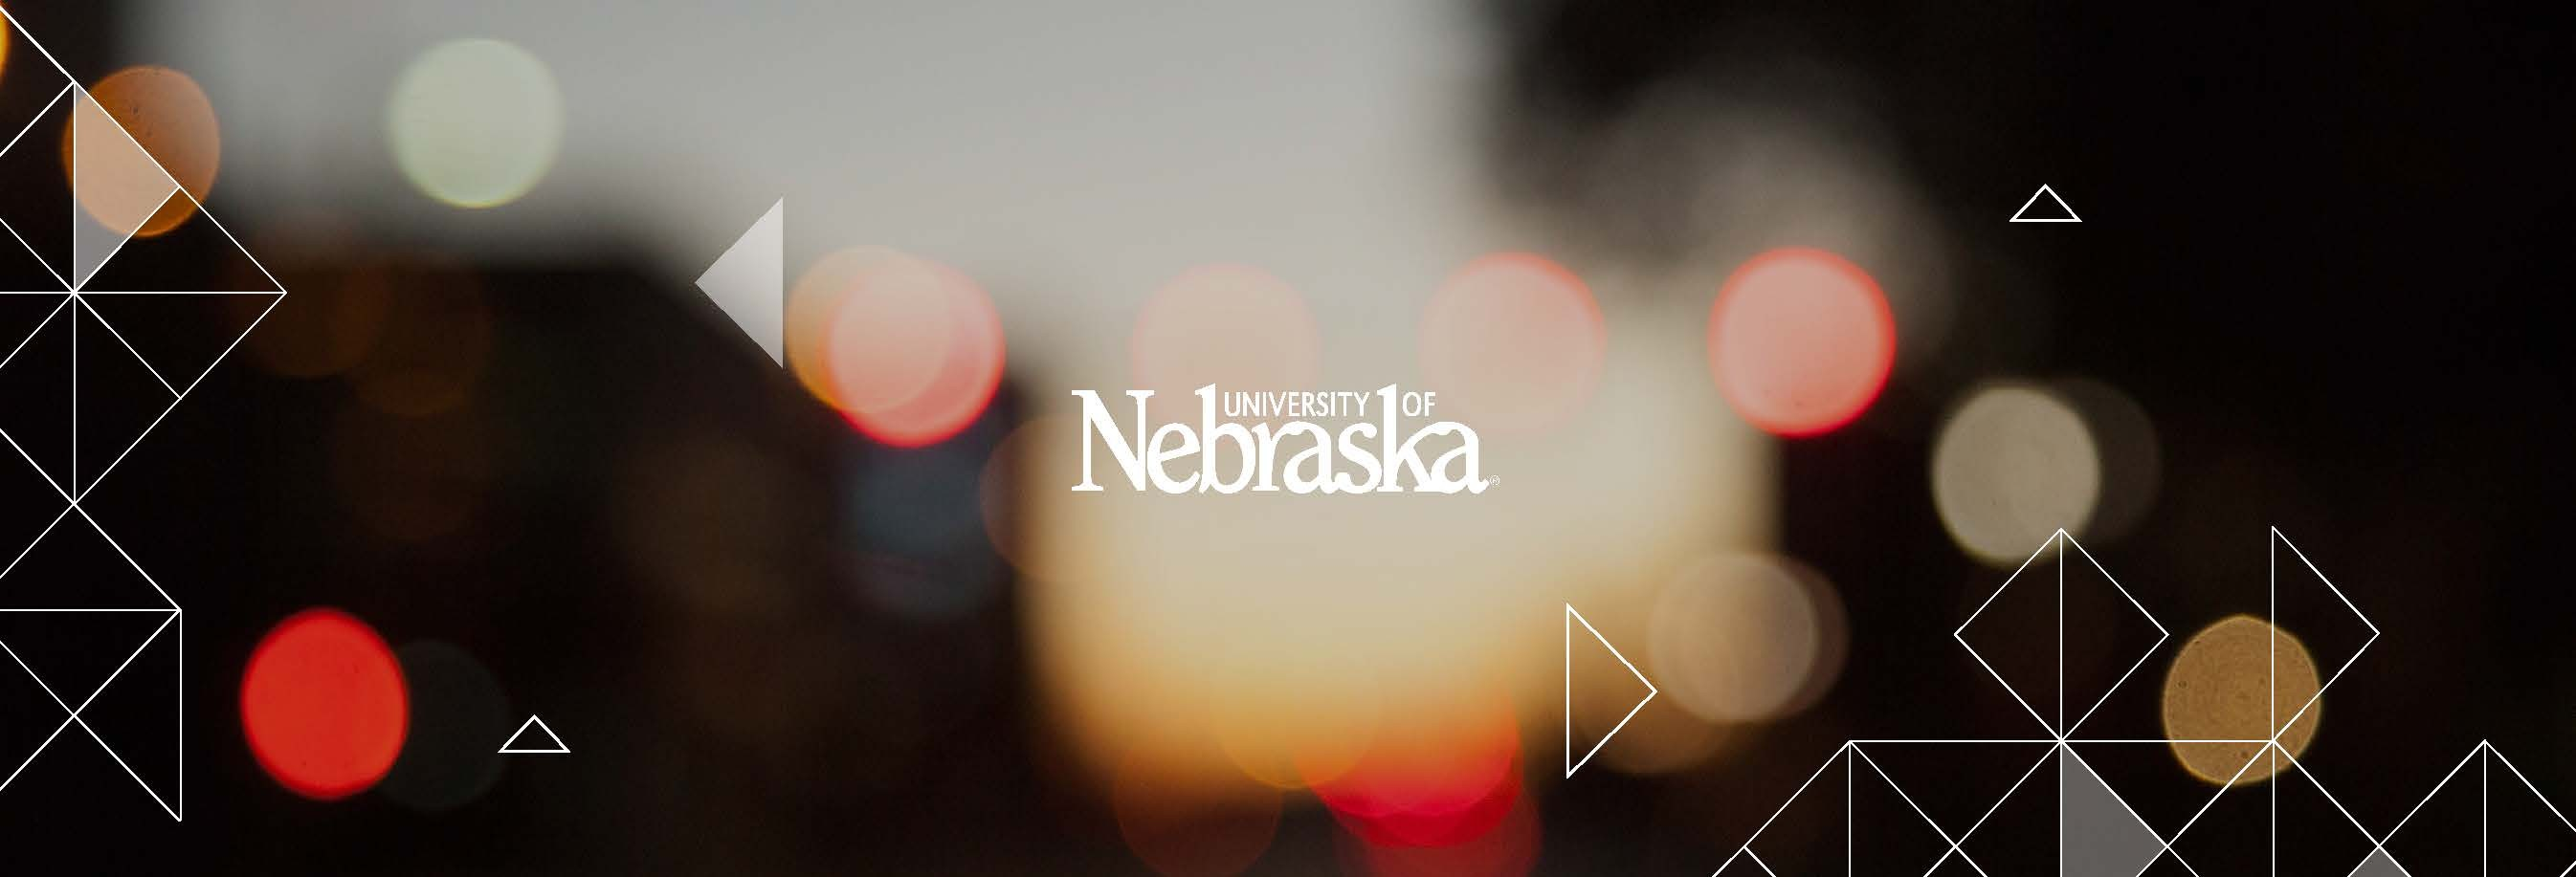 University of Nebraska   LinkedIn